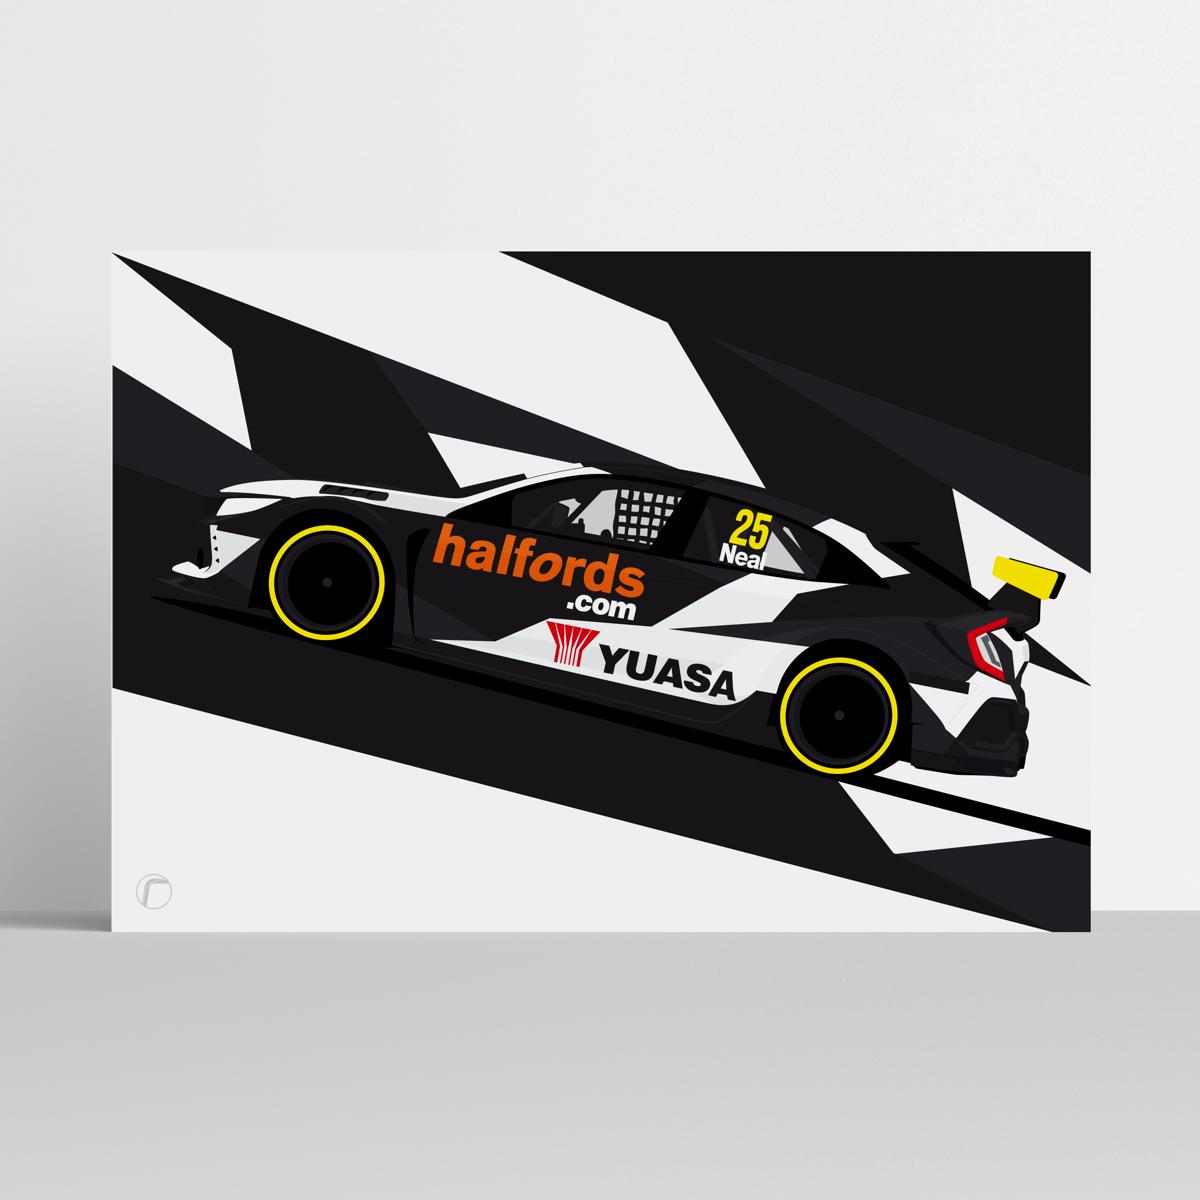 Image of Halfords Yuasa Racing | Neal 2020